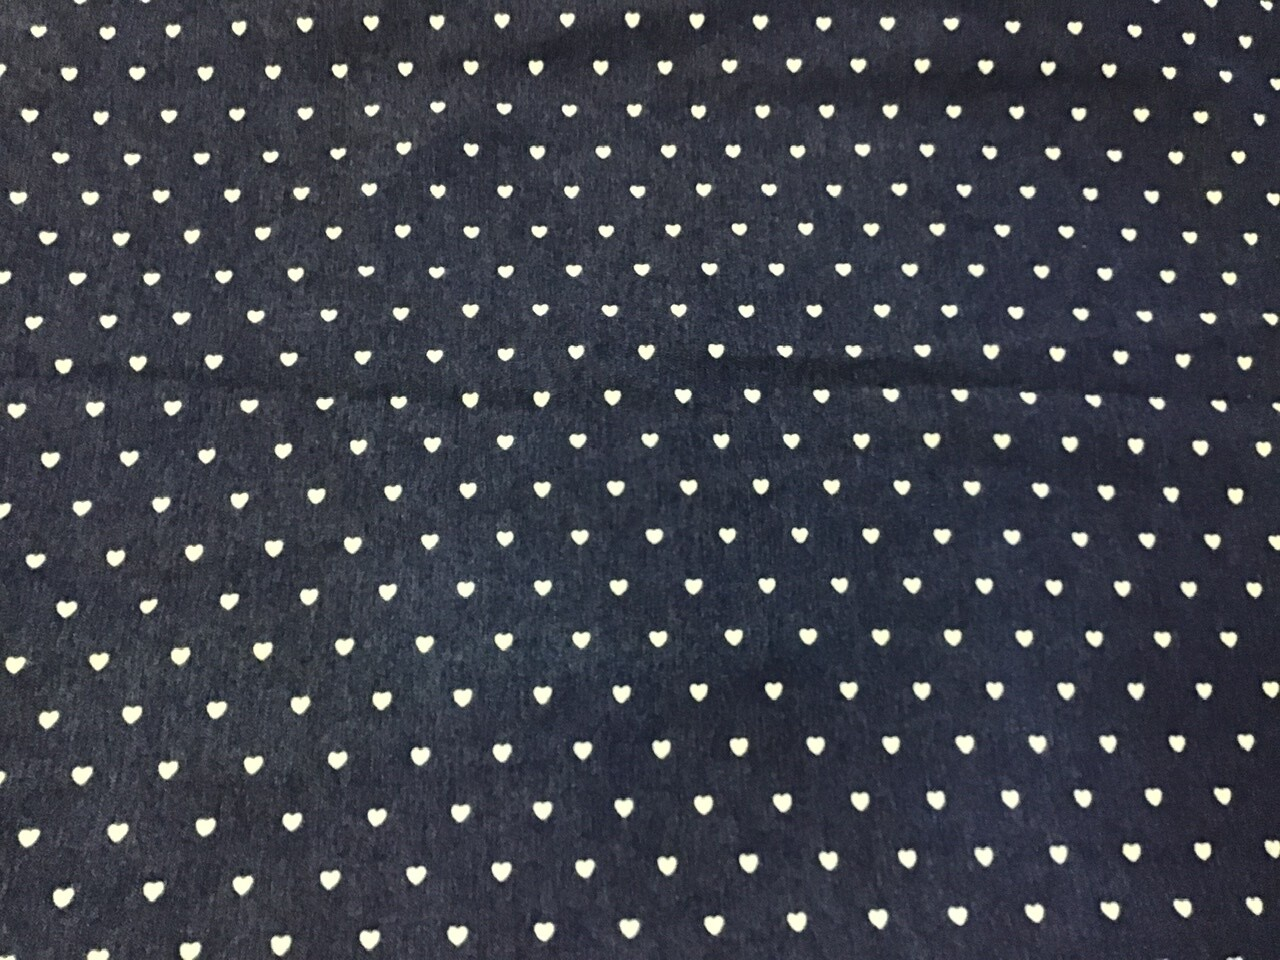 Fabric: Denim Baby Hearts